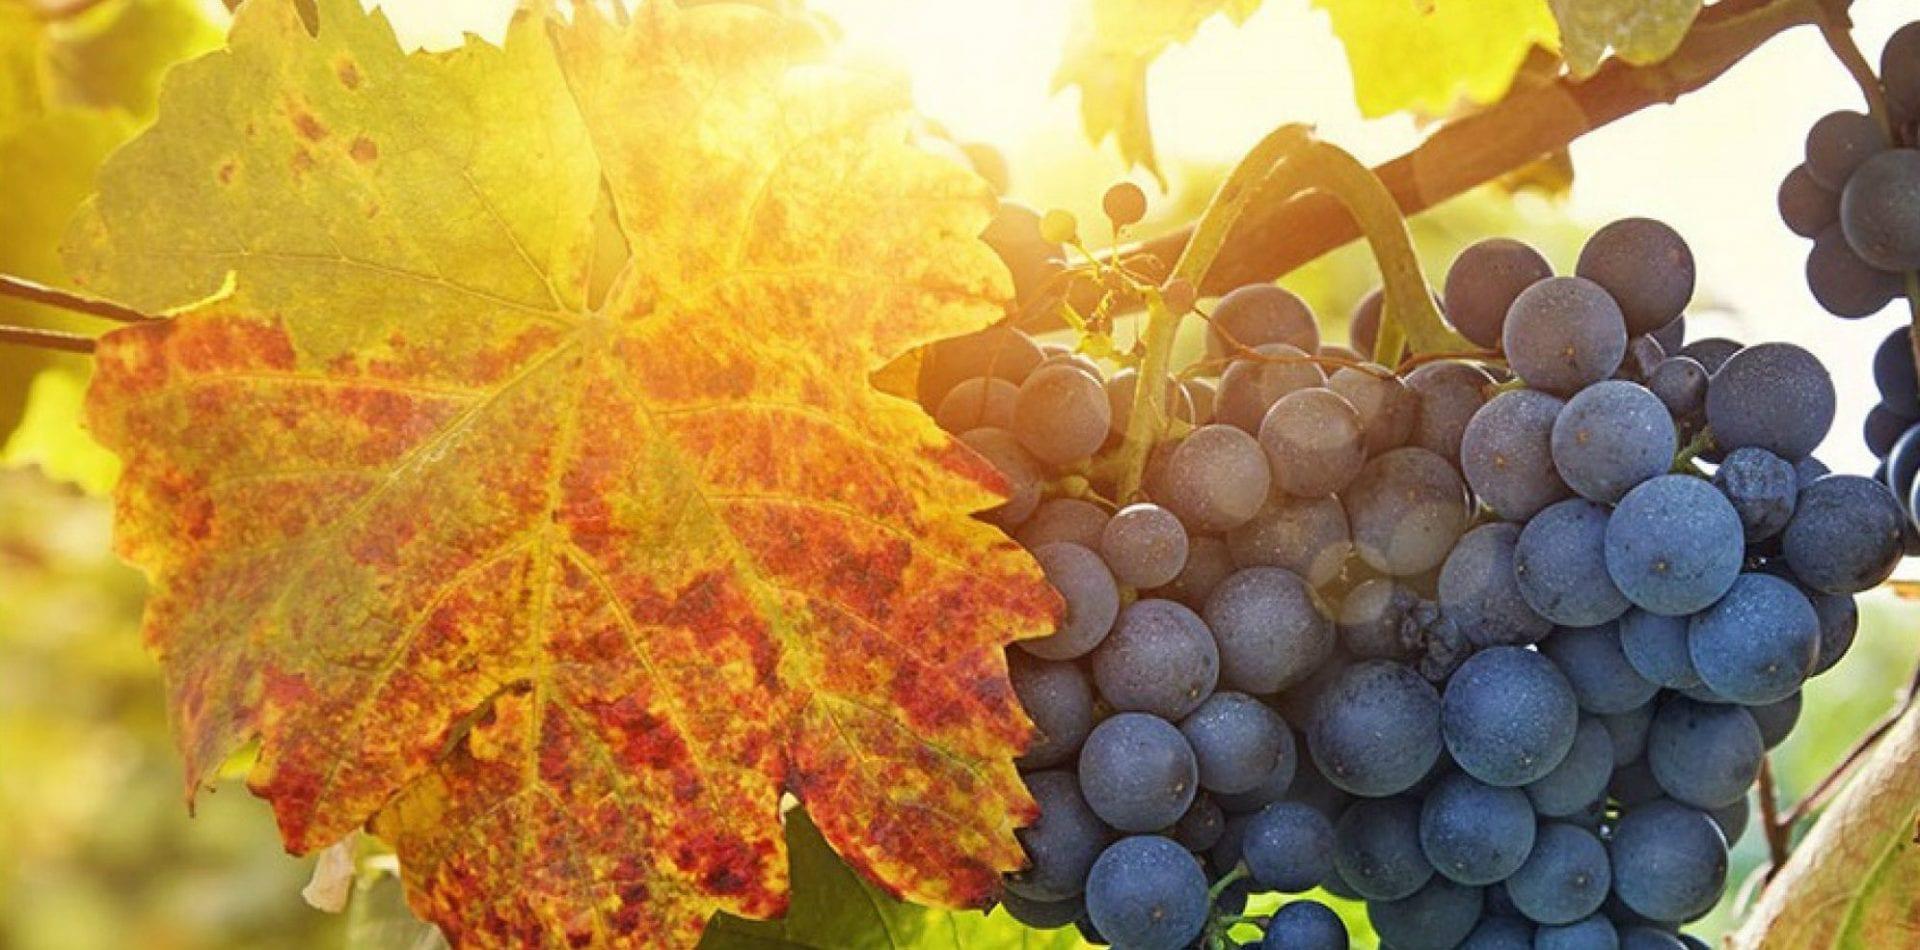 wall vineyard grapes fruit muro vigneto uva frutta